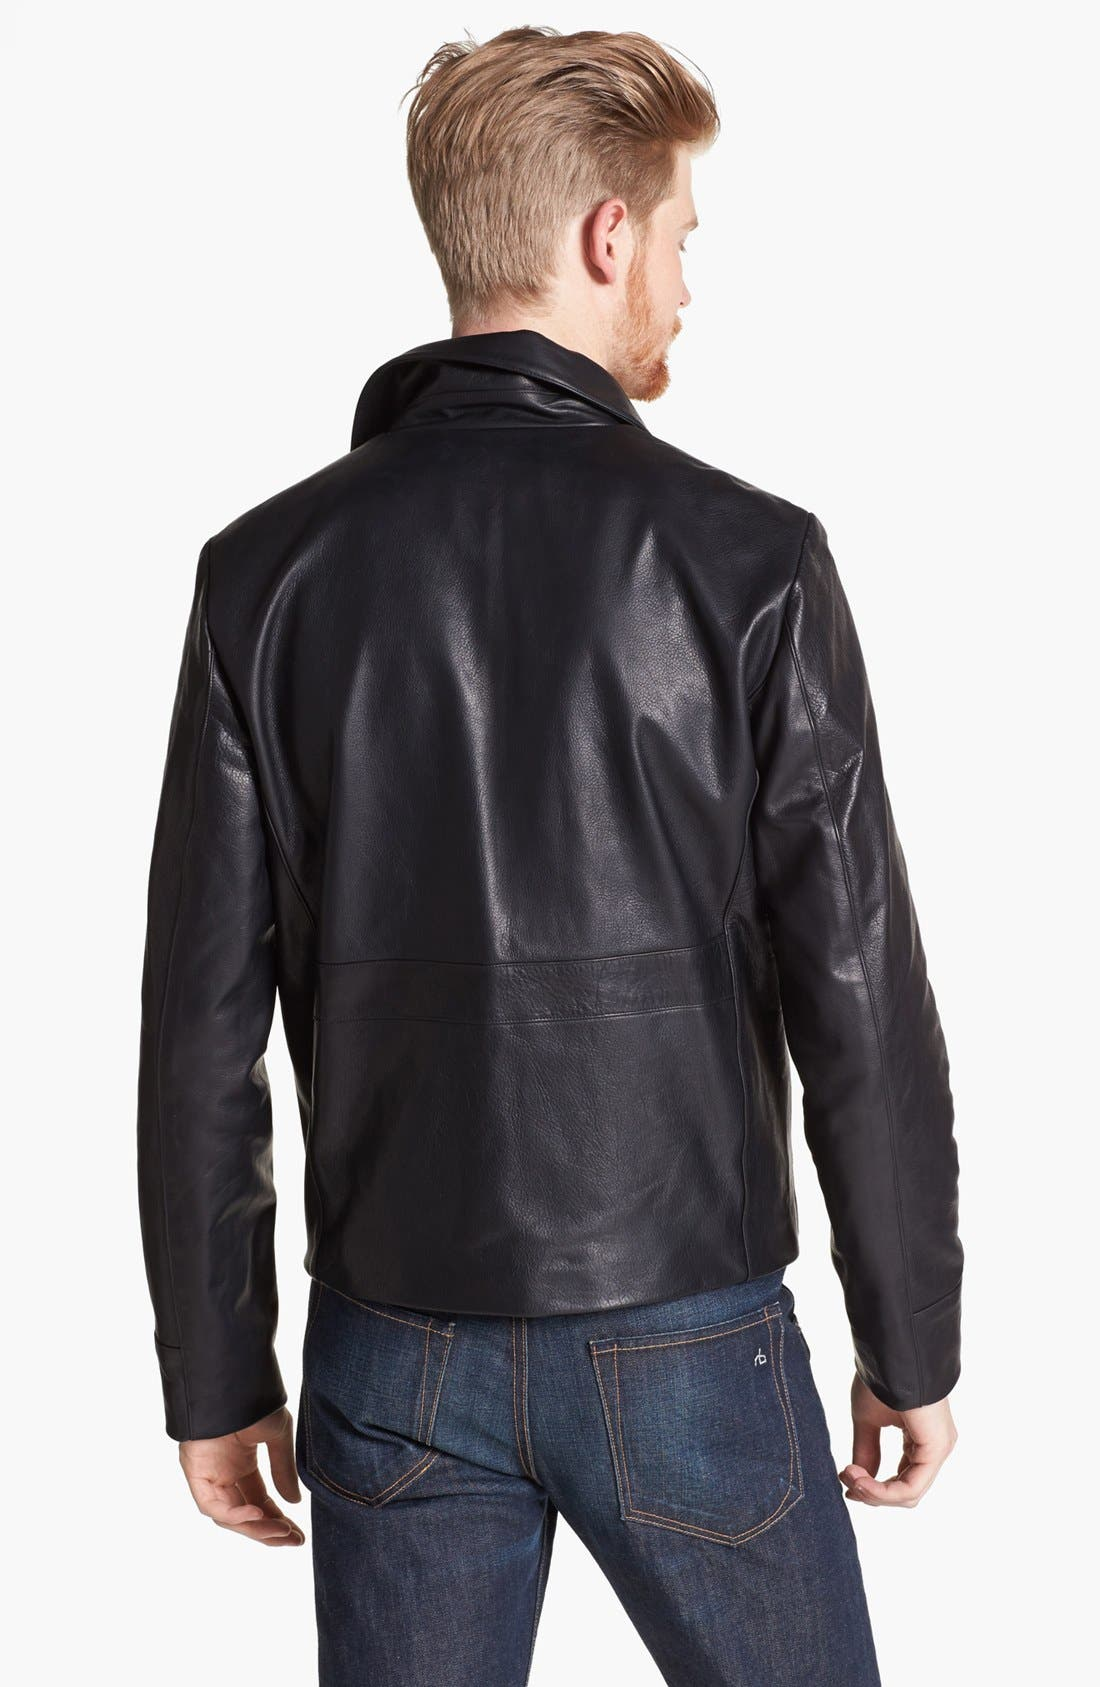 BILLY REID, Leather Flight Jacket, Alternate thumbnail 4, color, 001